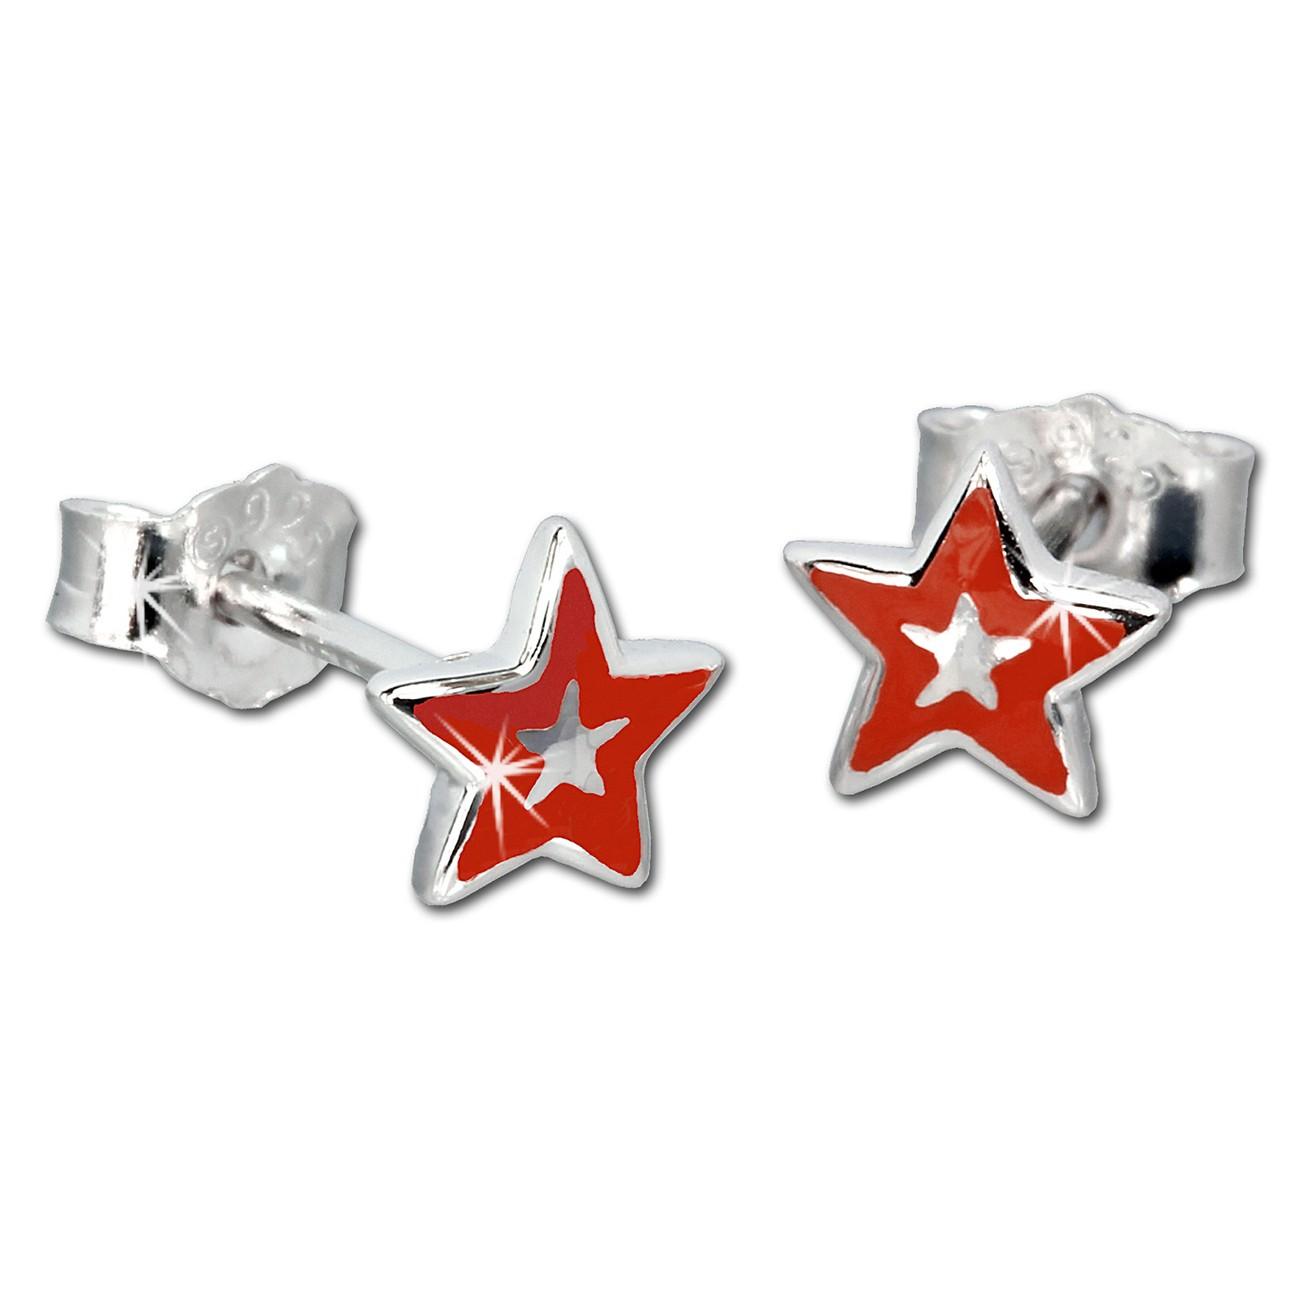 Kinder Ohrring Stern rot Silber Ohrstecker Kinderschmuck TW SDO200R